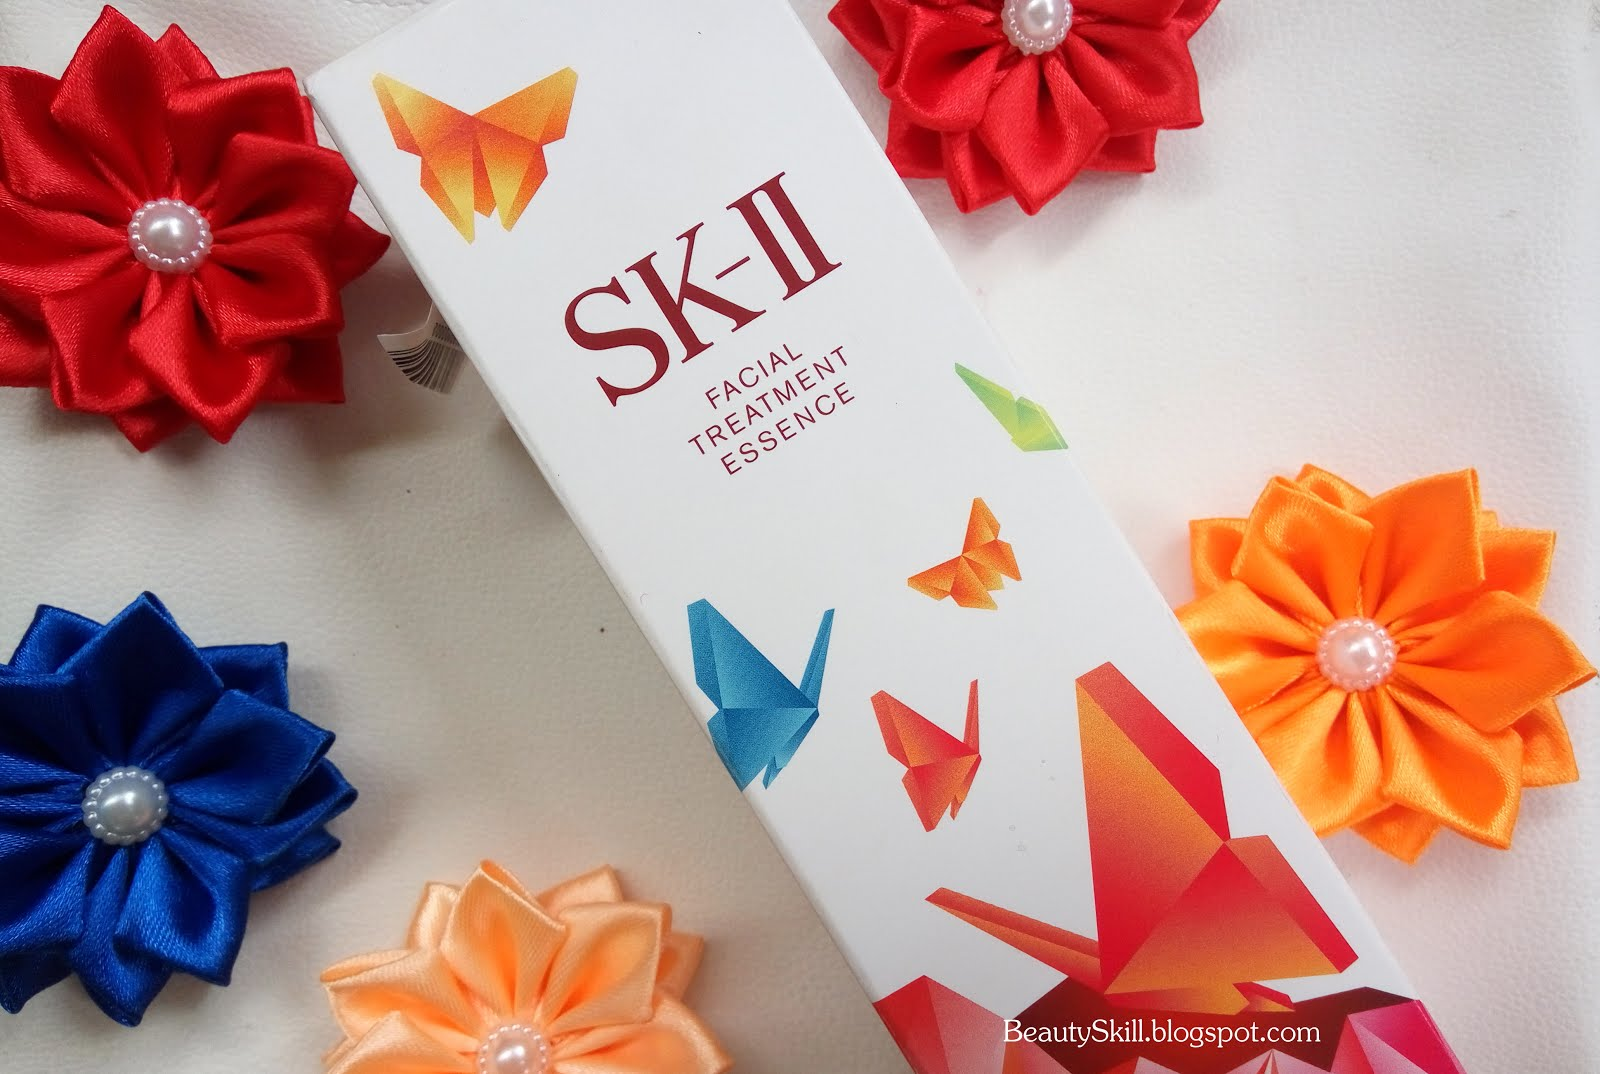 Review Sk Ii Facial Treatment Essence Tampil Cantik Fte 230ml